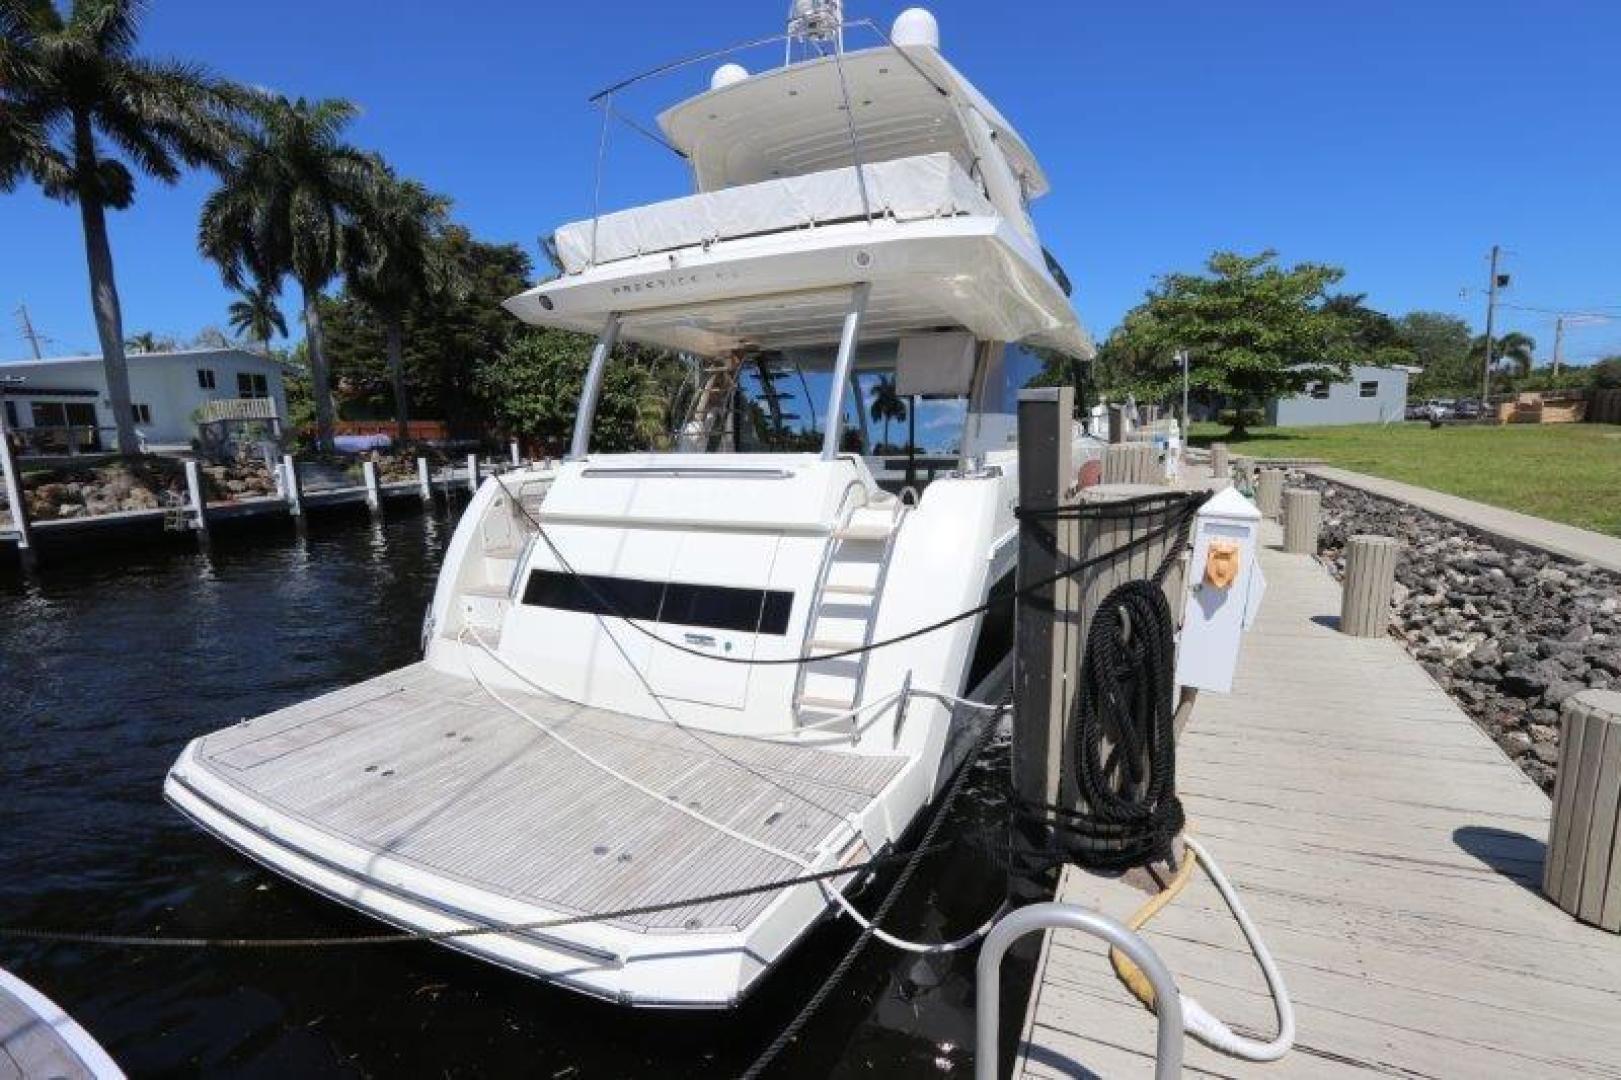 Prestige-Motoryacht 2017-Breathe Easy Fort Lauderdale-Florida-United States-1303845   Thumbnail